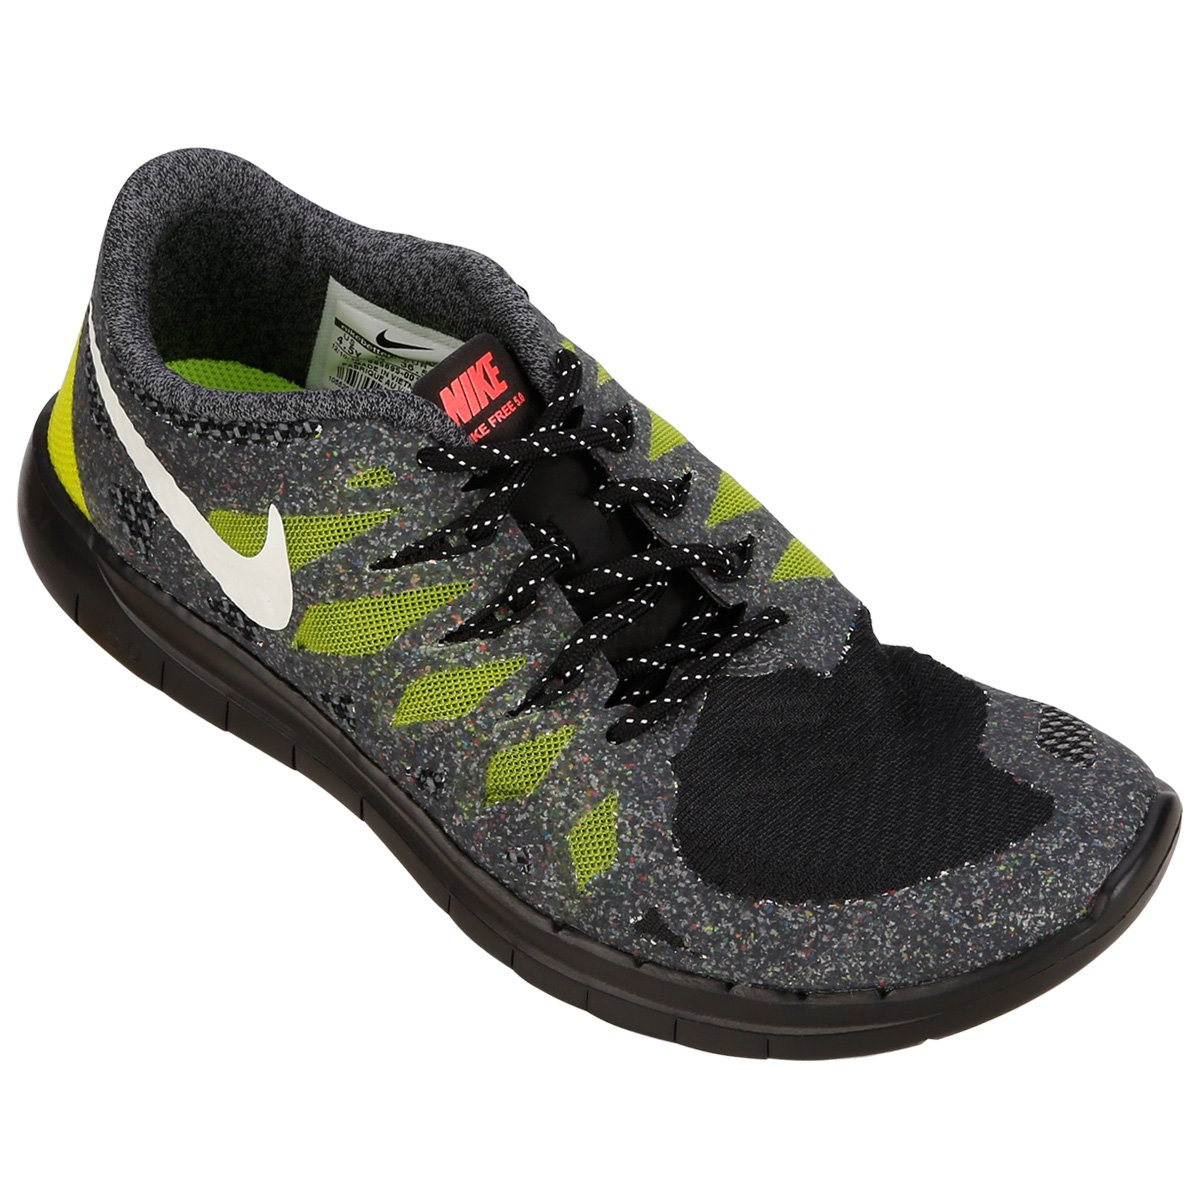 2c09e05378 ... new zealand tênis nike free 5.0 glow infantil compre agora netshoes  8a4fb 3242b